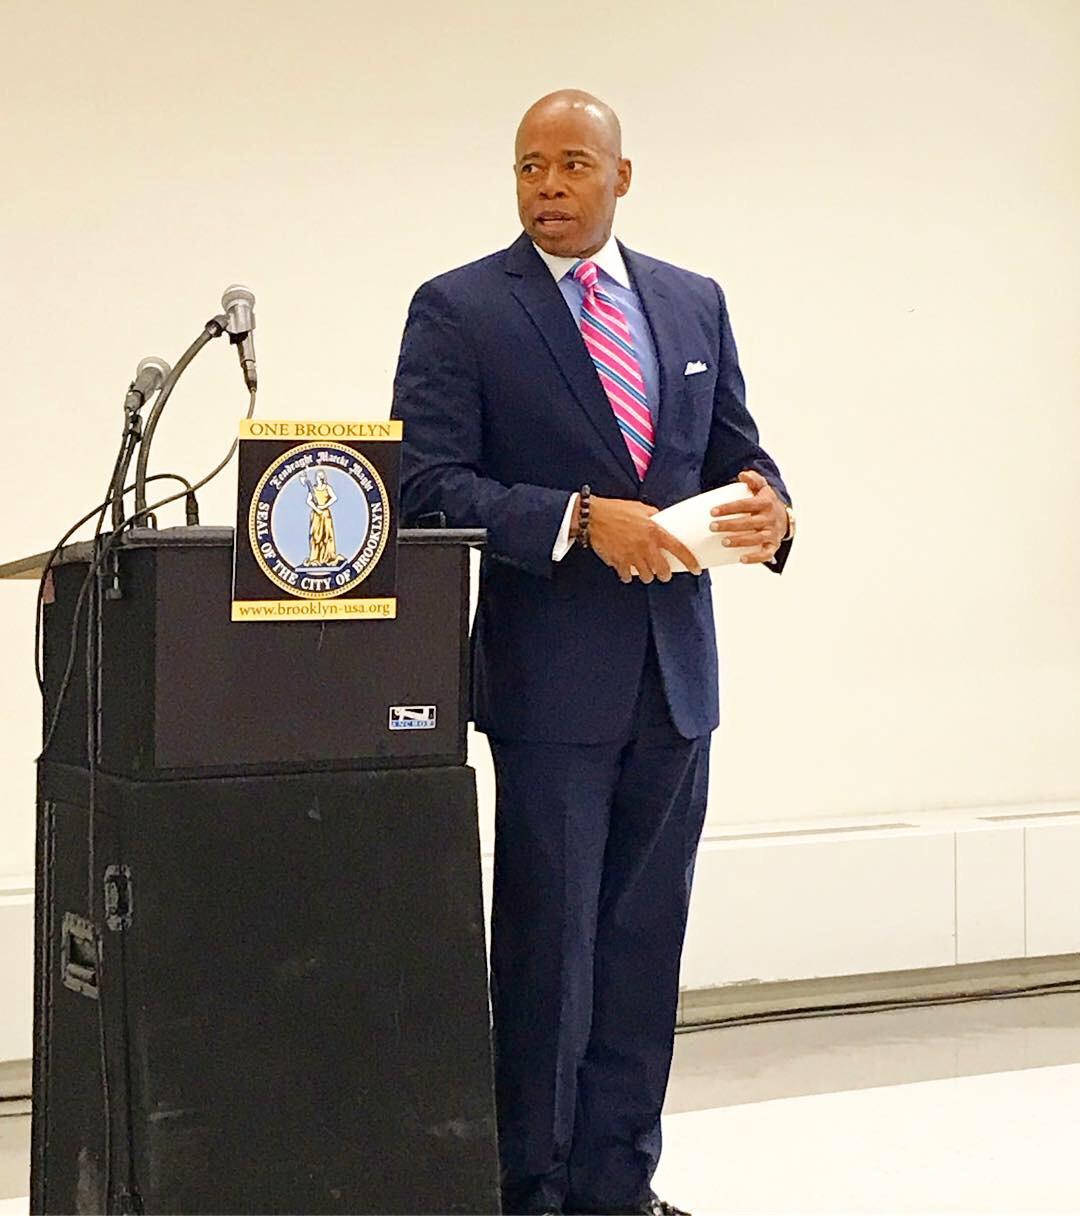 Brooklyn Borough President Eric L. Adams